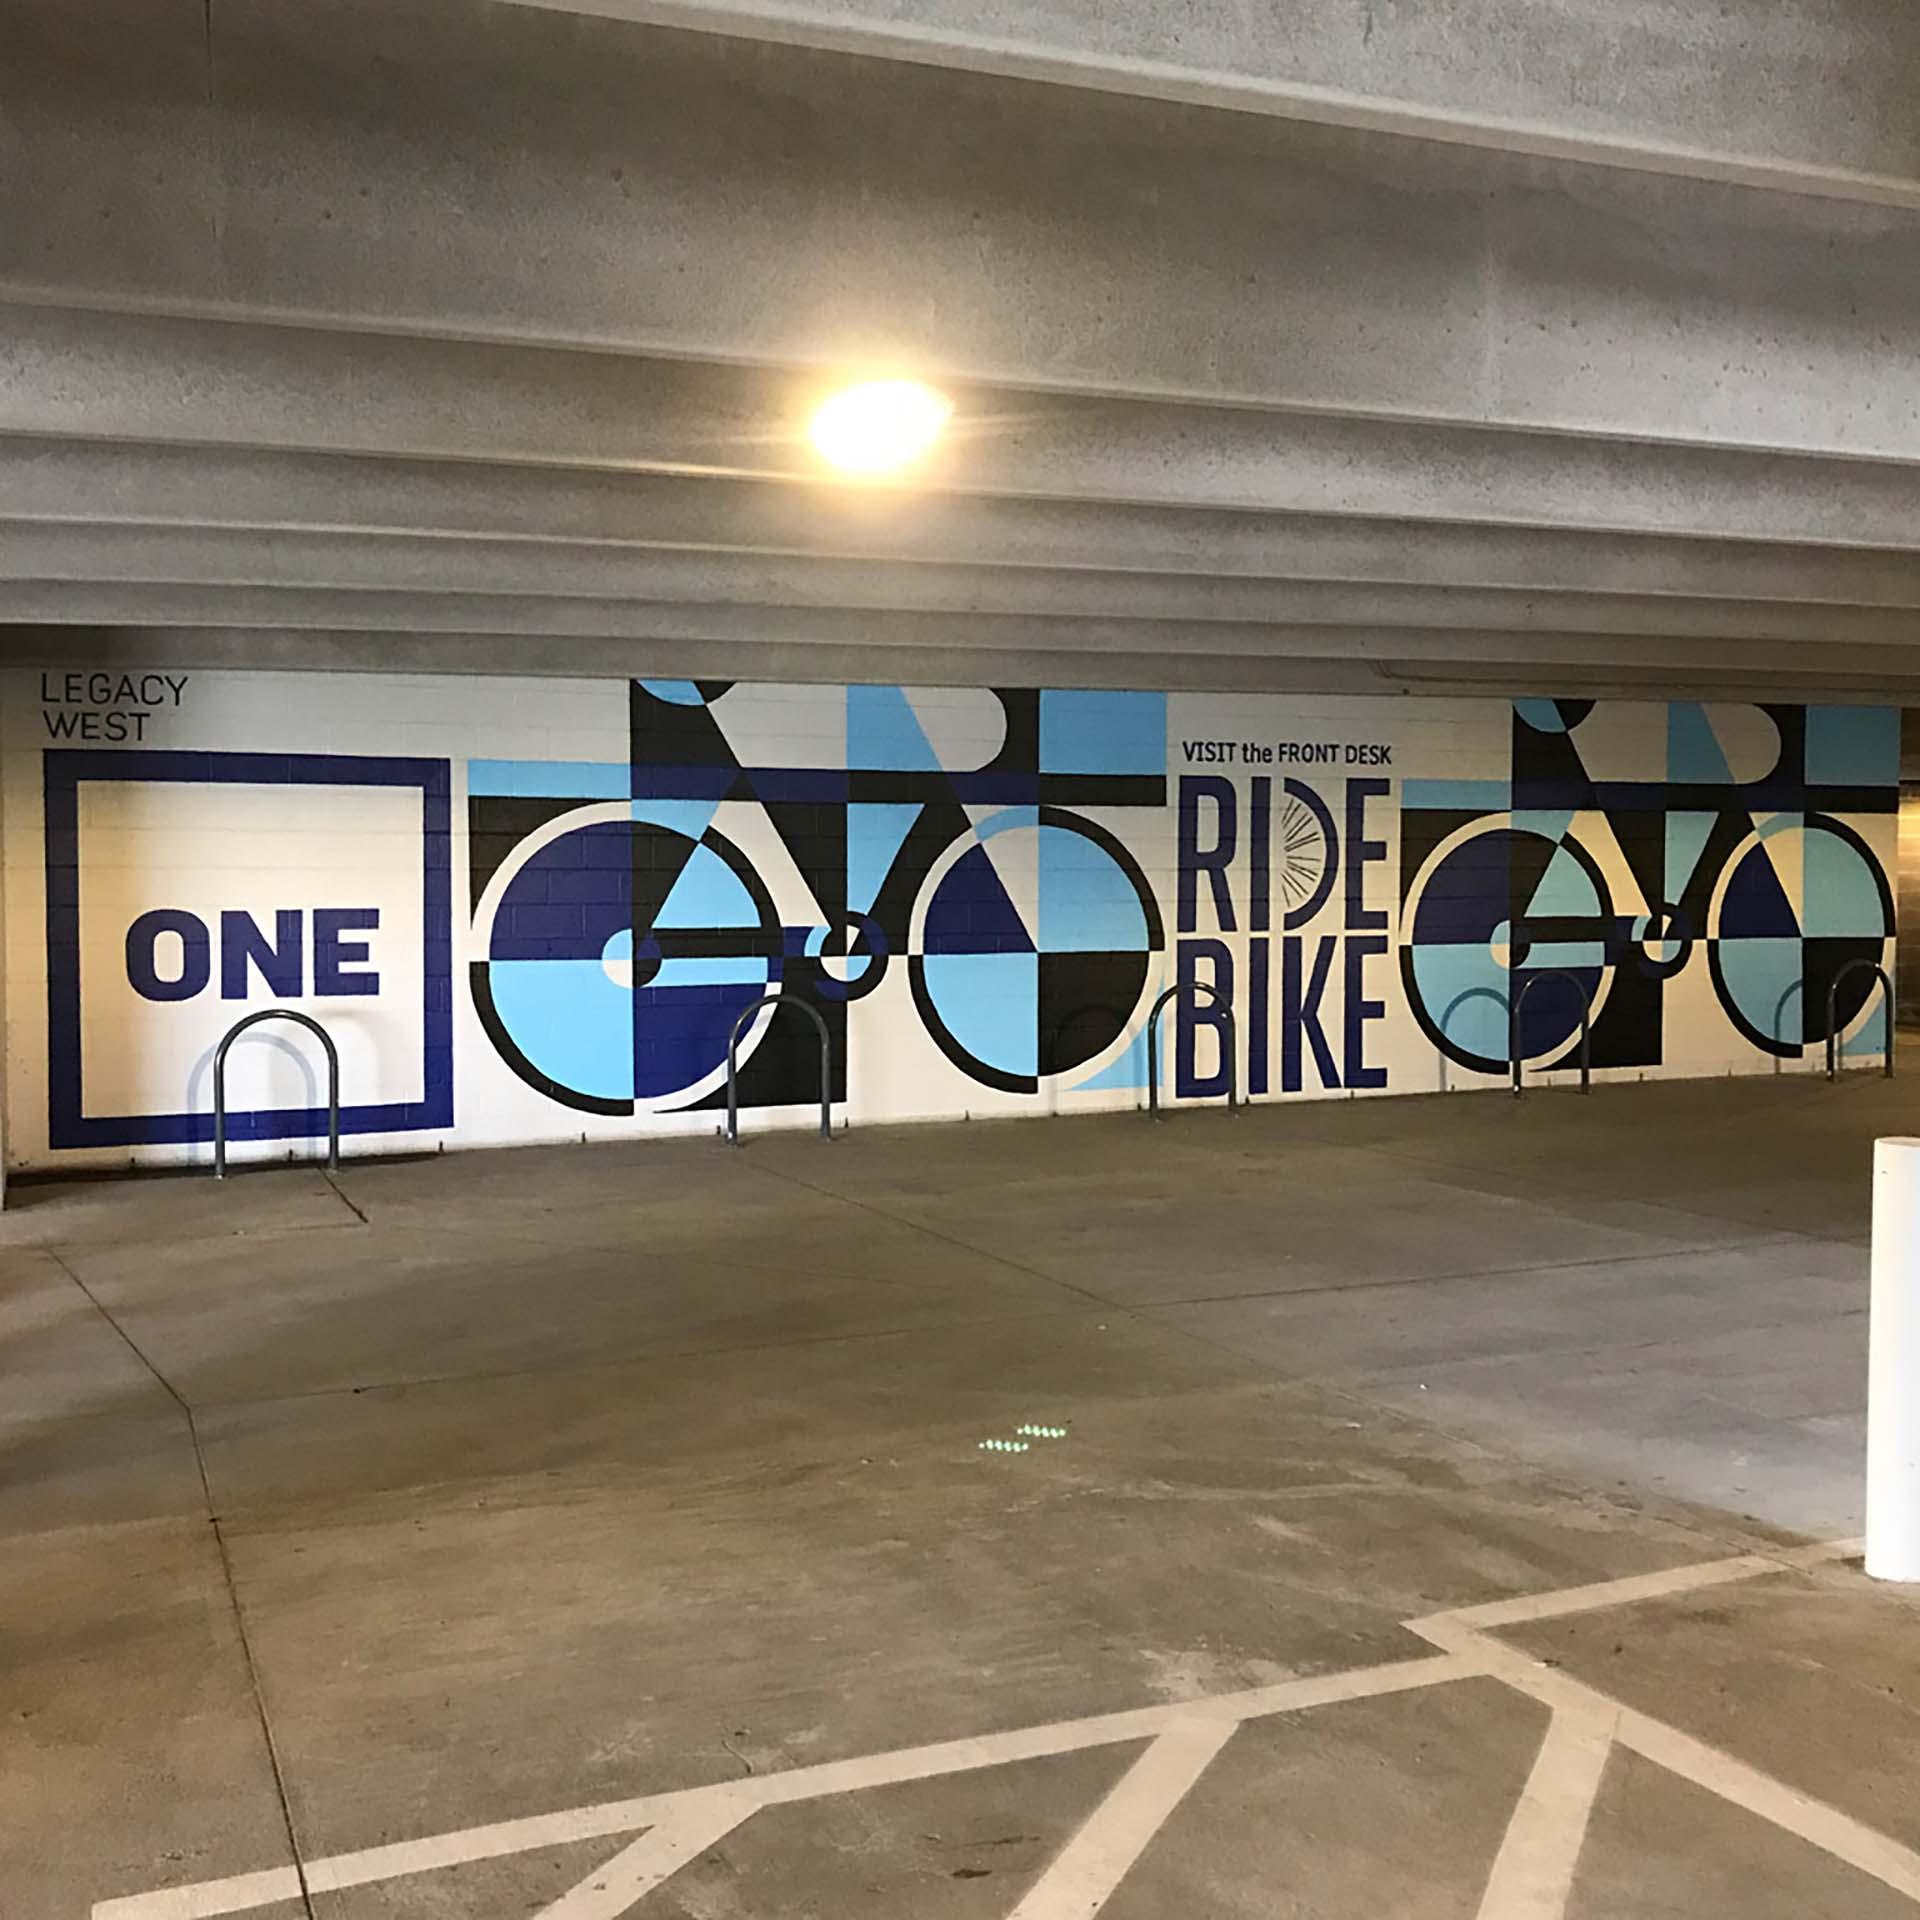 ride bike - cycling mural - sign mural - hand lettering - custom mural - mural - Dace Kidd - Mural Artist Tx